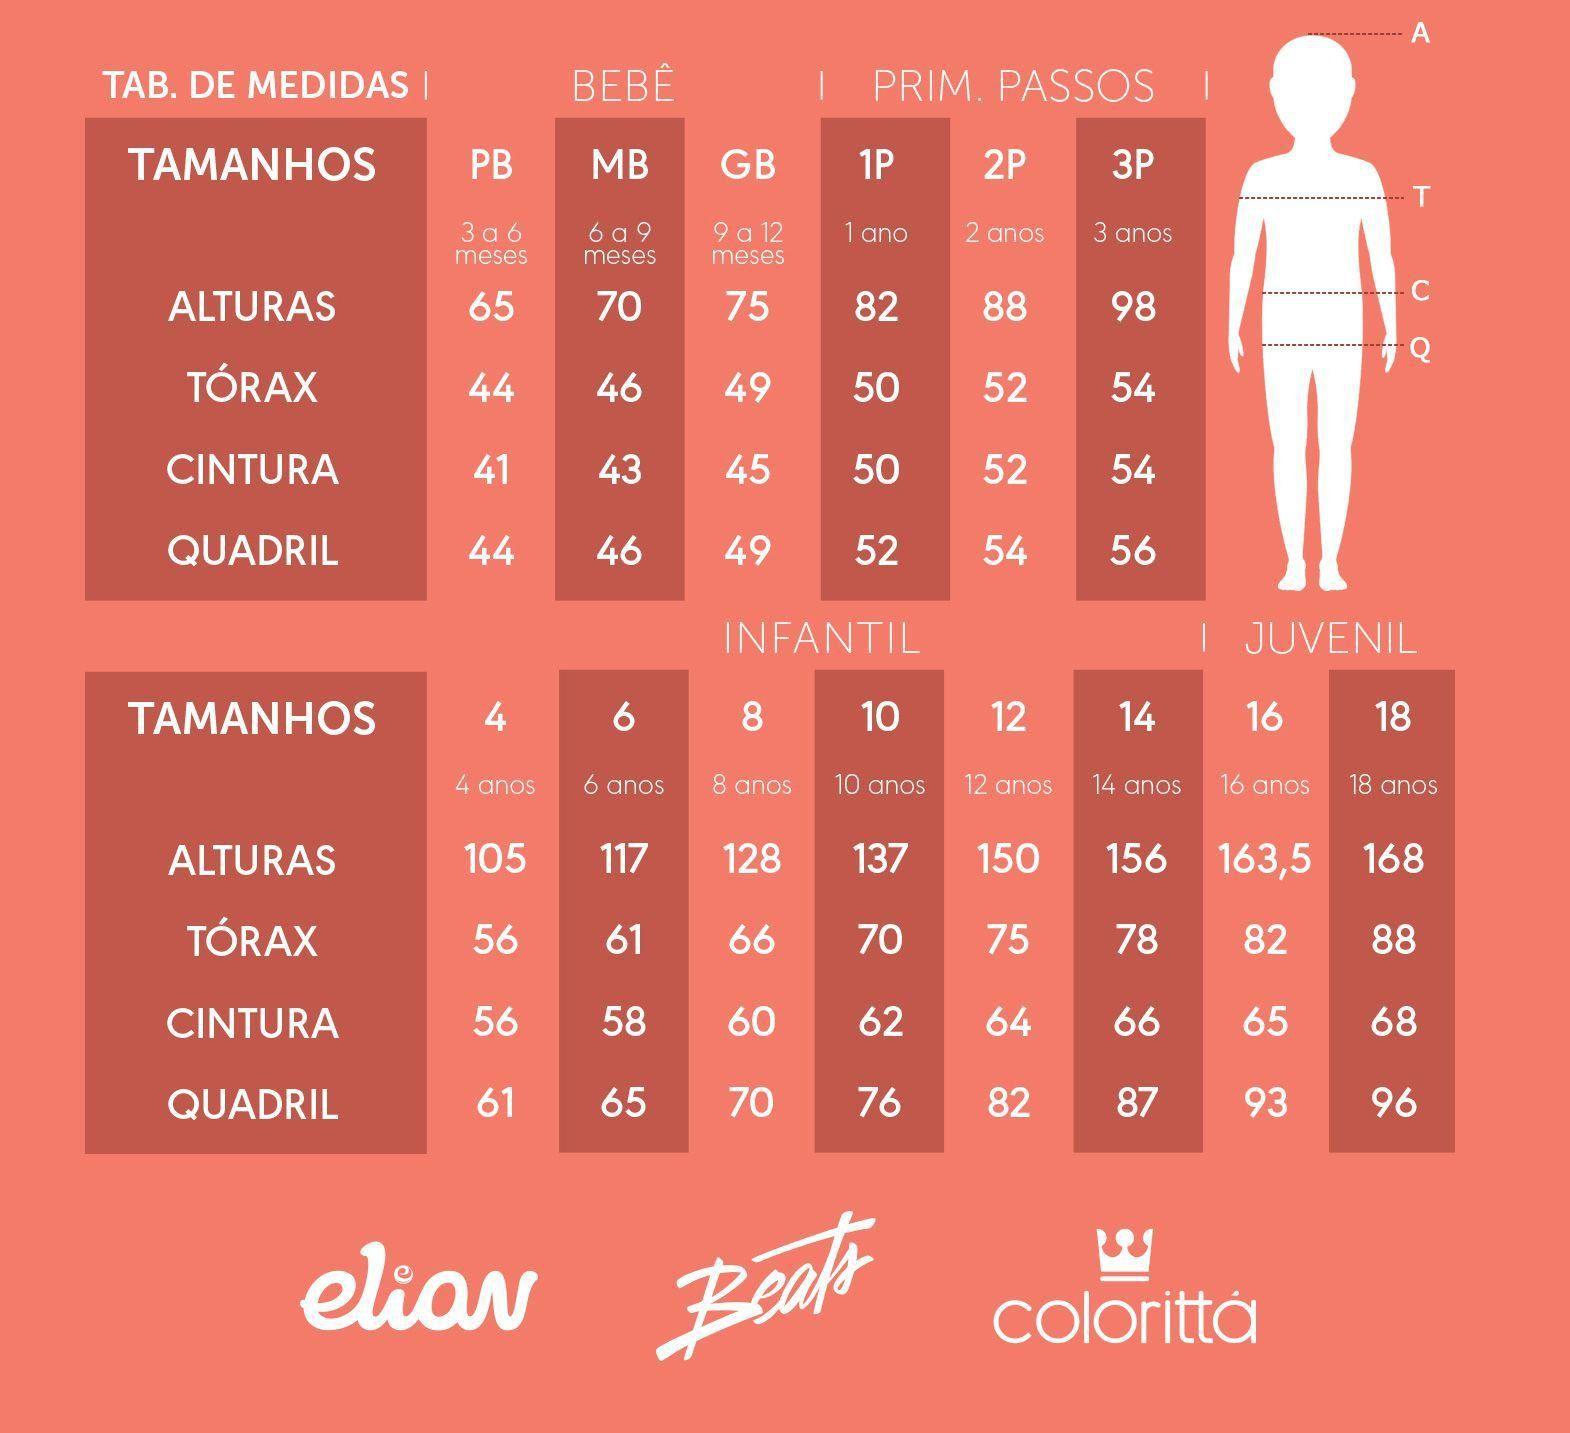 Pijama Infantil Feminino Inverno Azul Hey Girl - Elian: Tabela de medidas